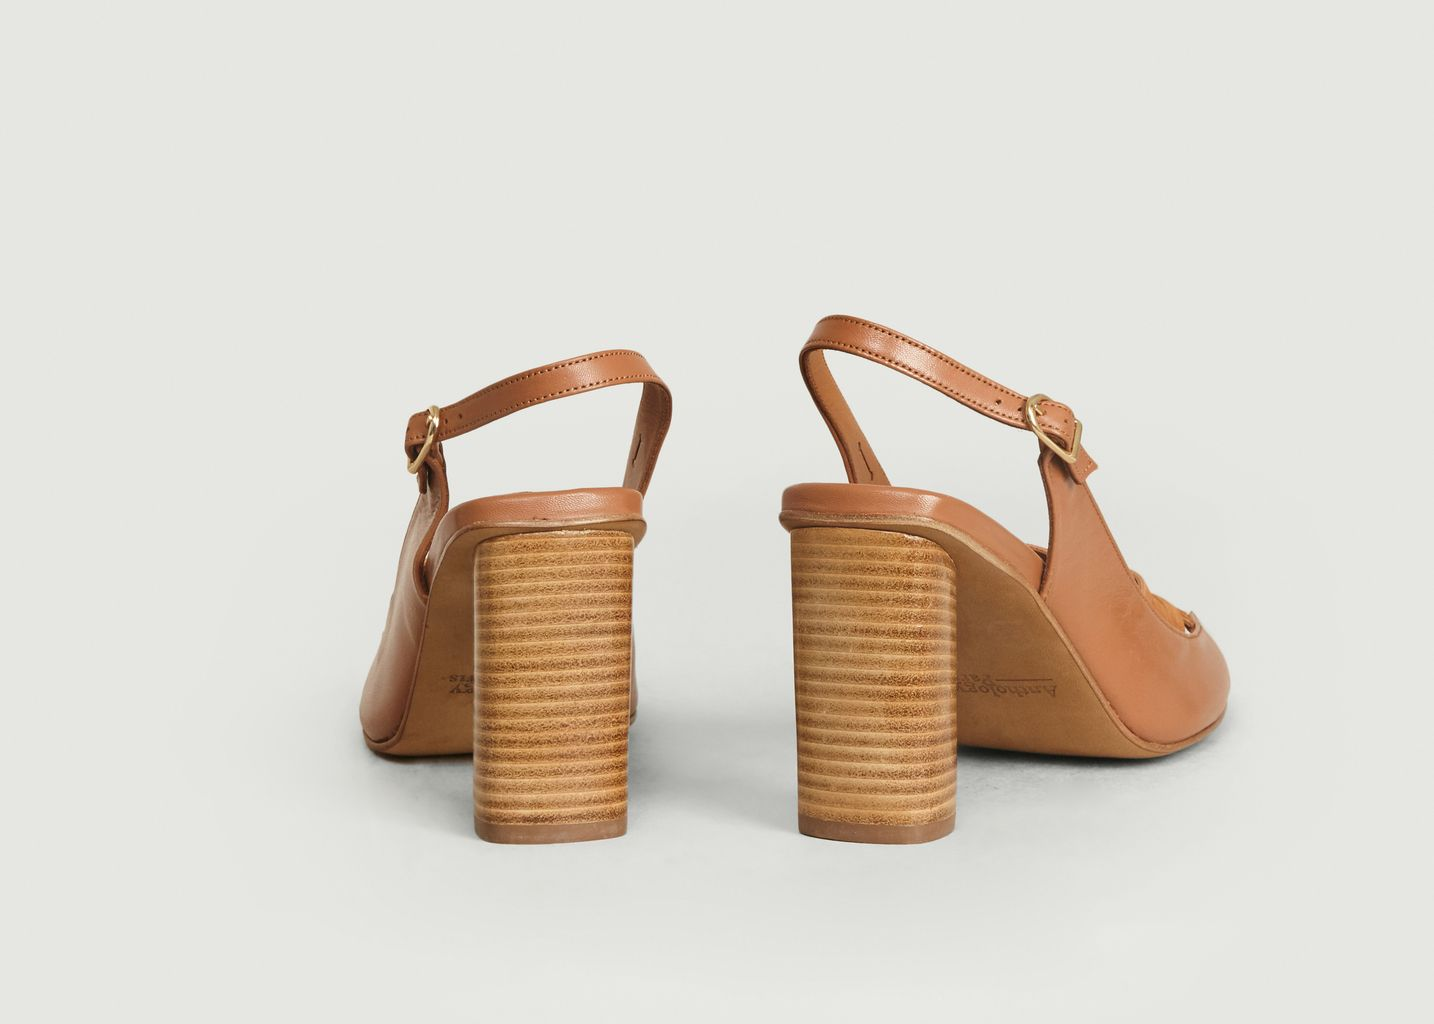 Sandales sling-back Aesa - Anthology Paris